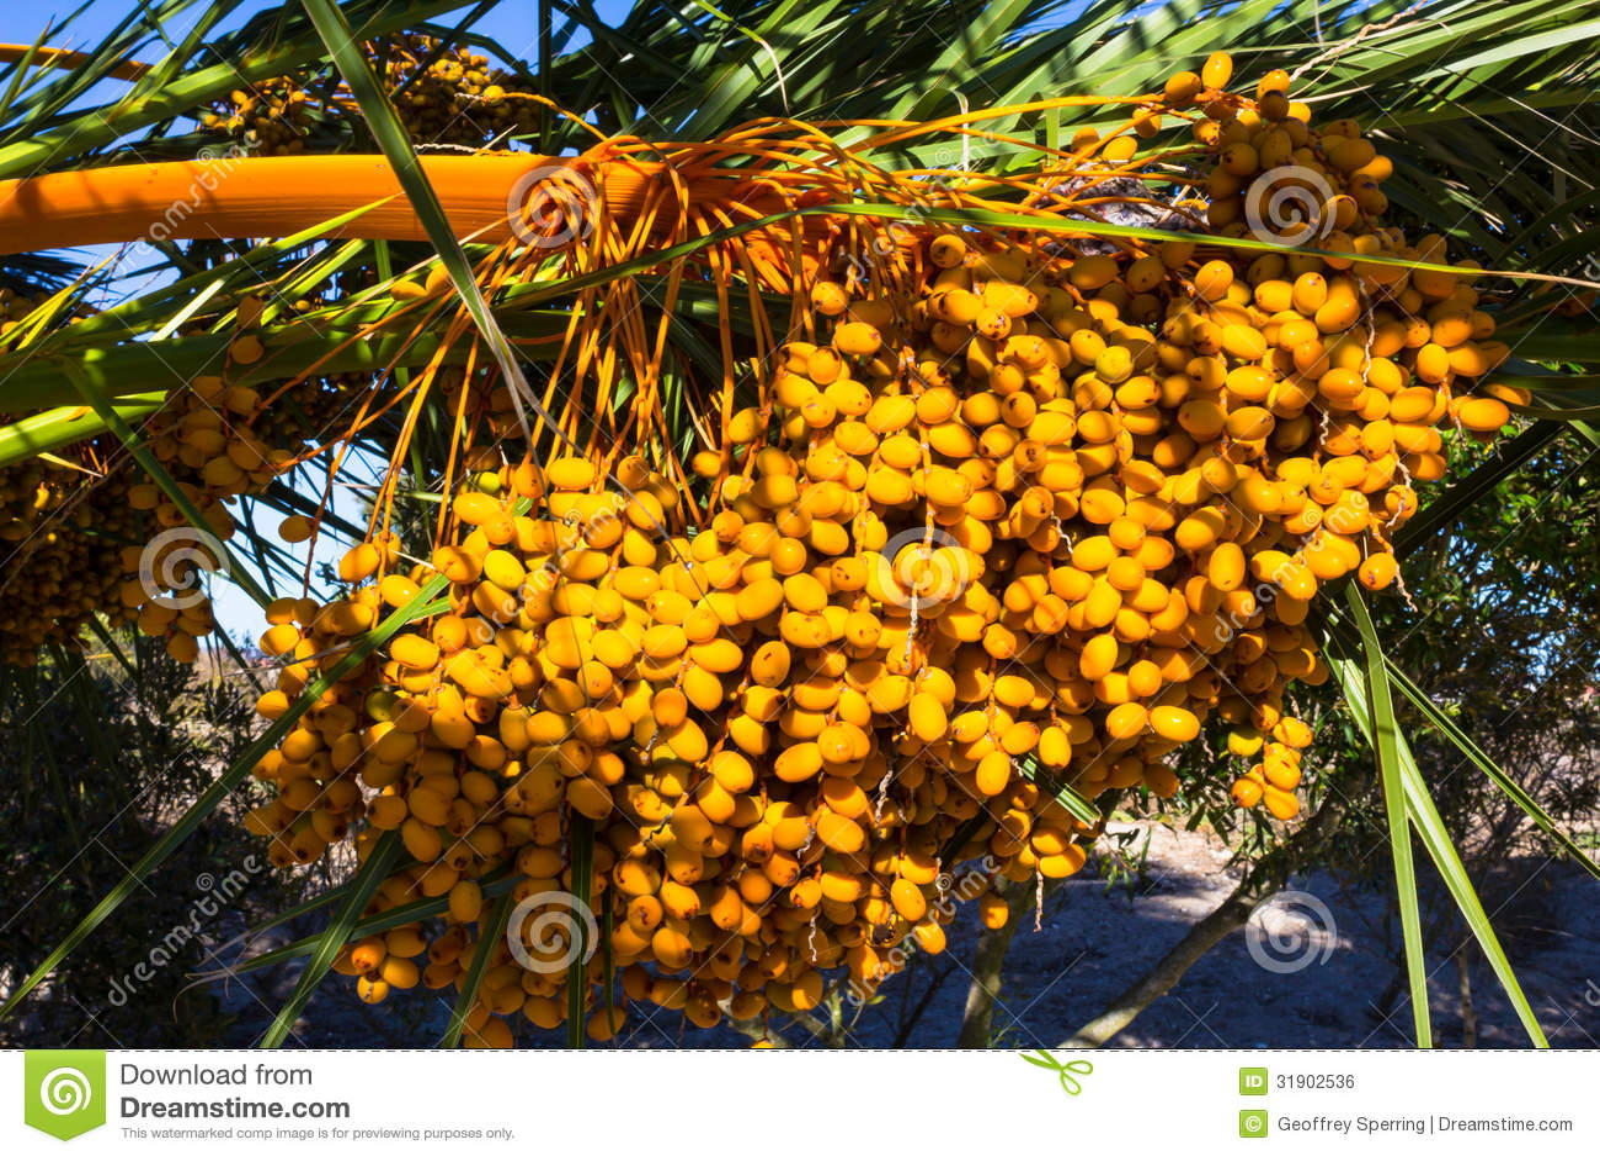 are berries fruit date fruit